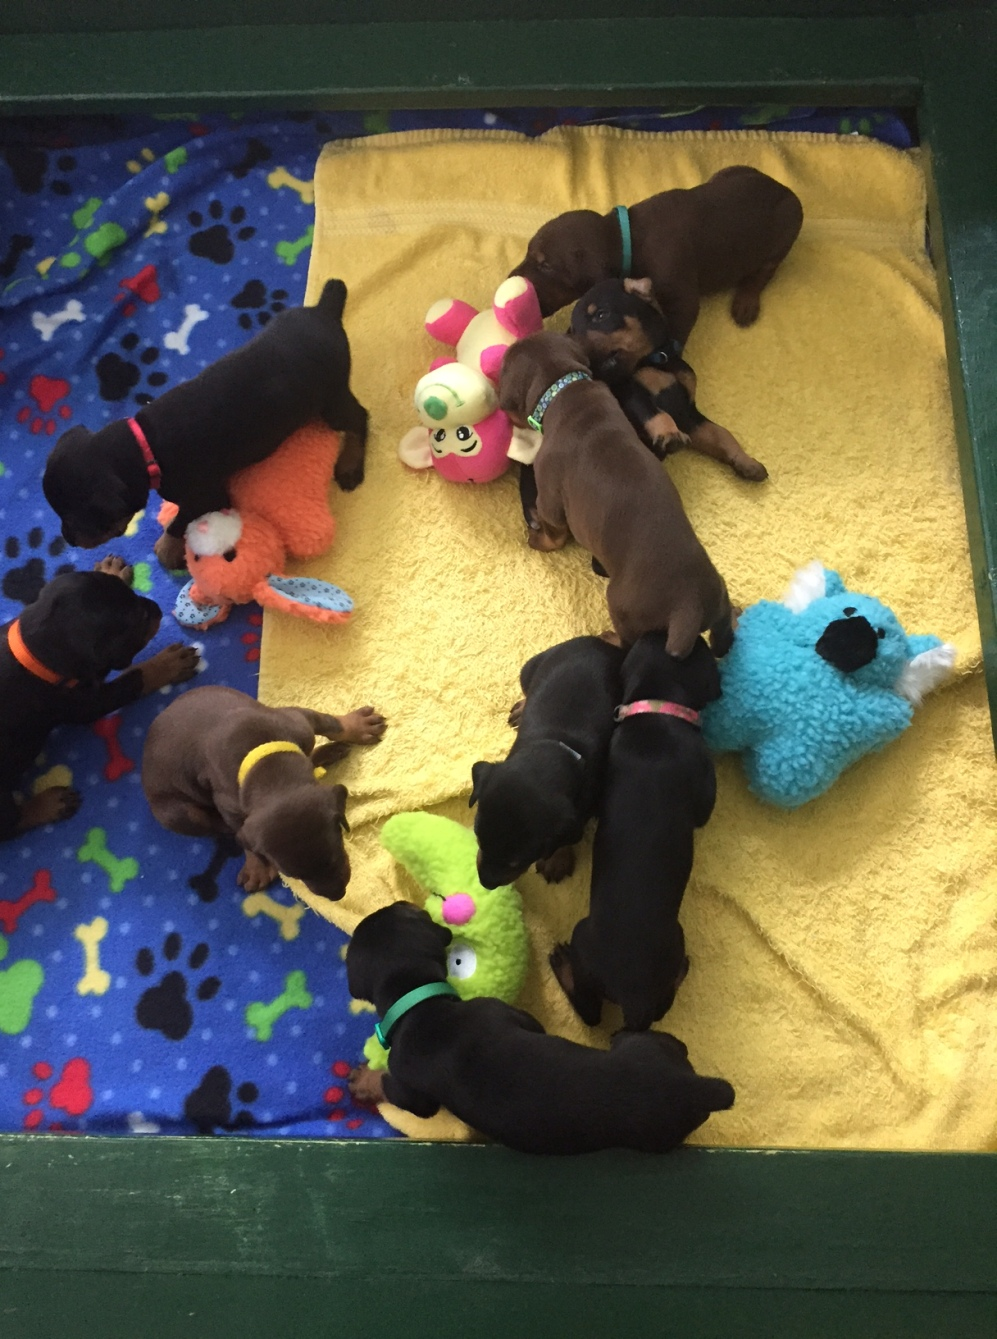 #5 Puppies